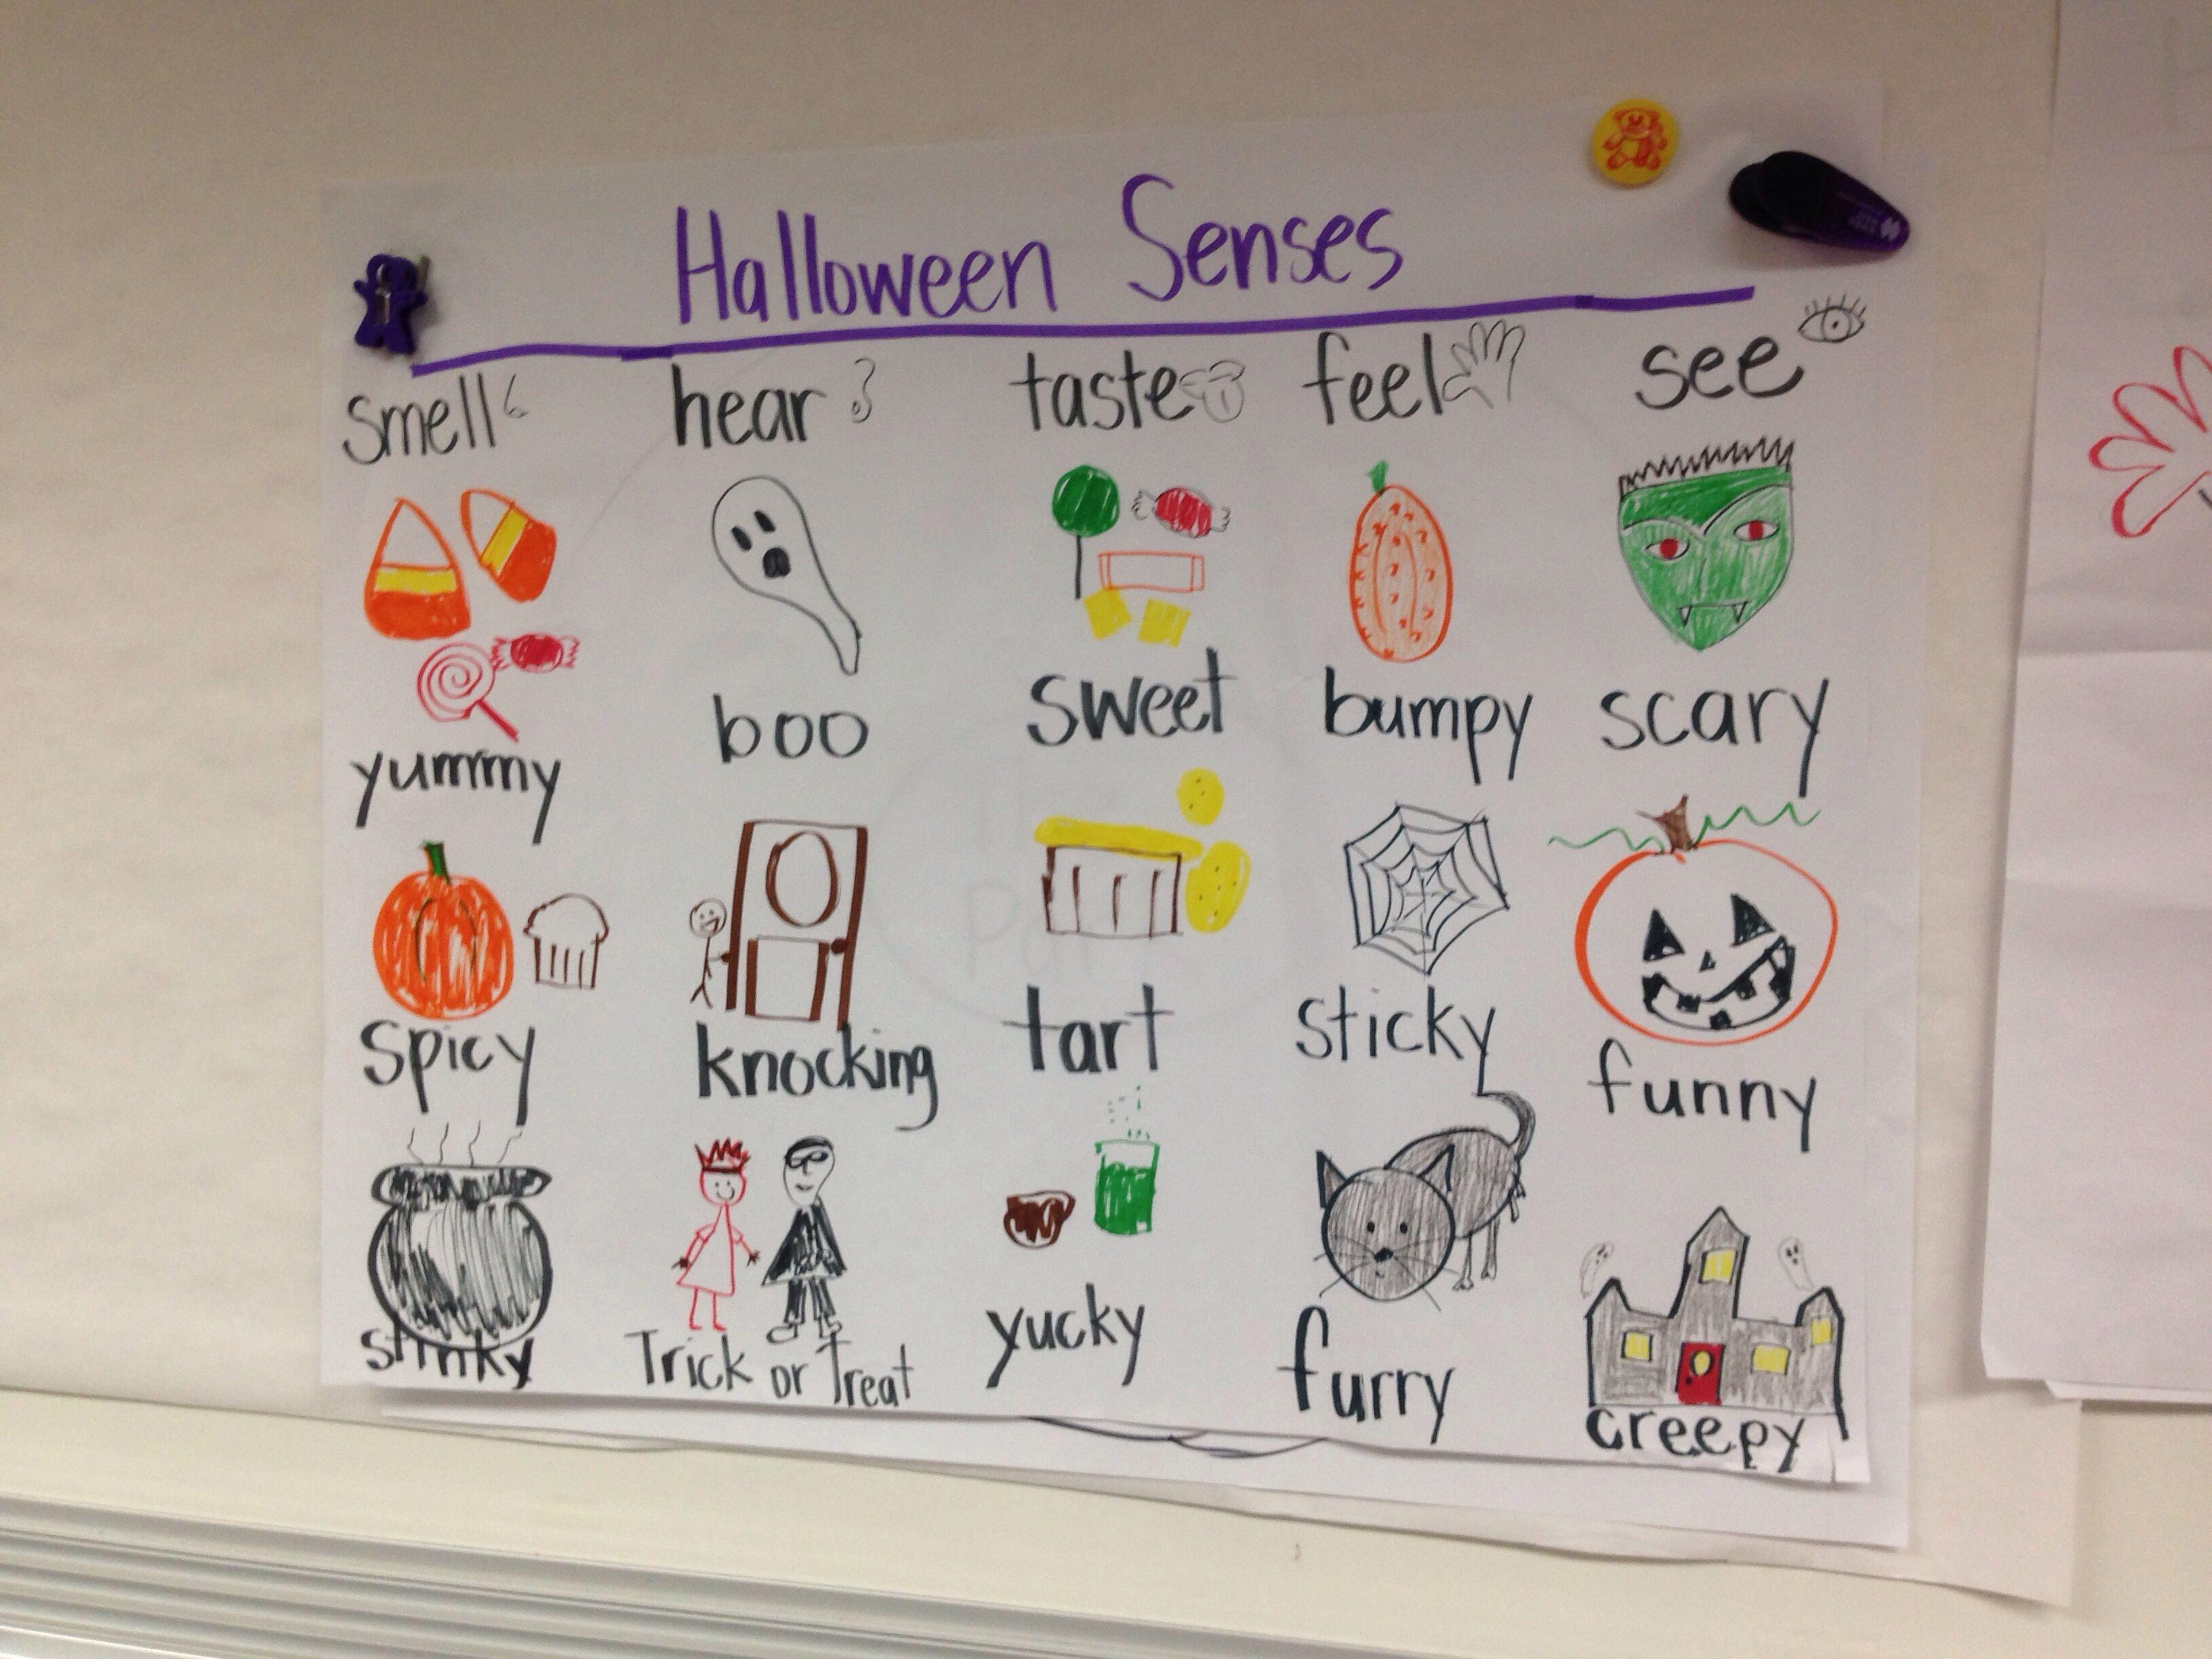 5 Senses Thinking Maps For Kindergarten Halloween